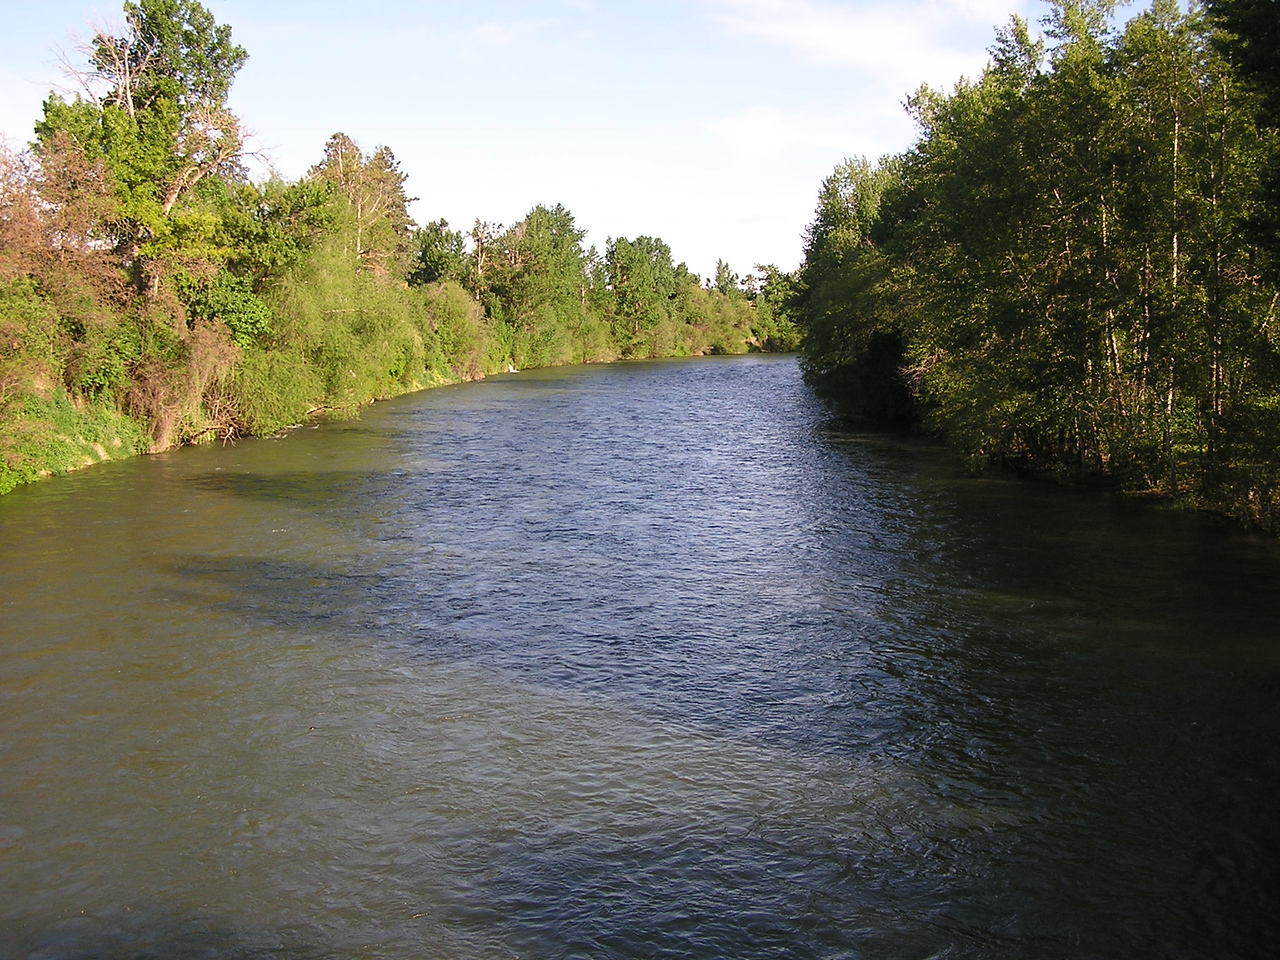 Yakima River from the bridge at Riverfront park.